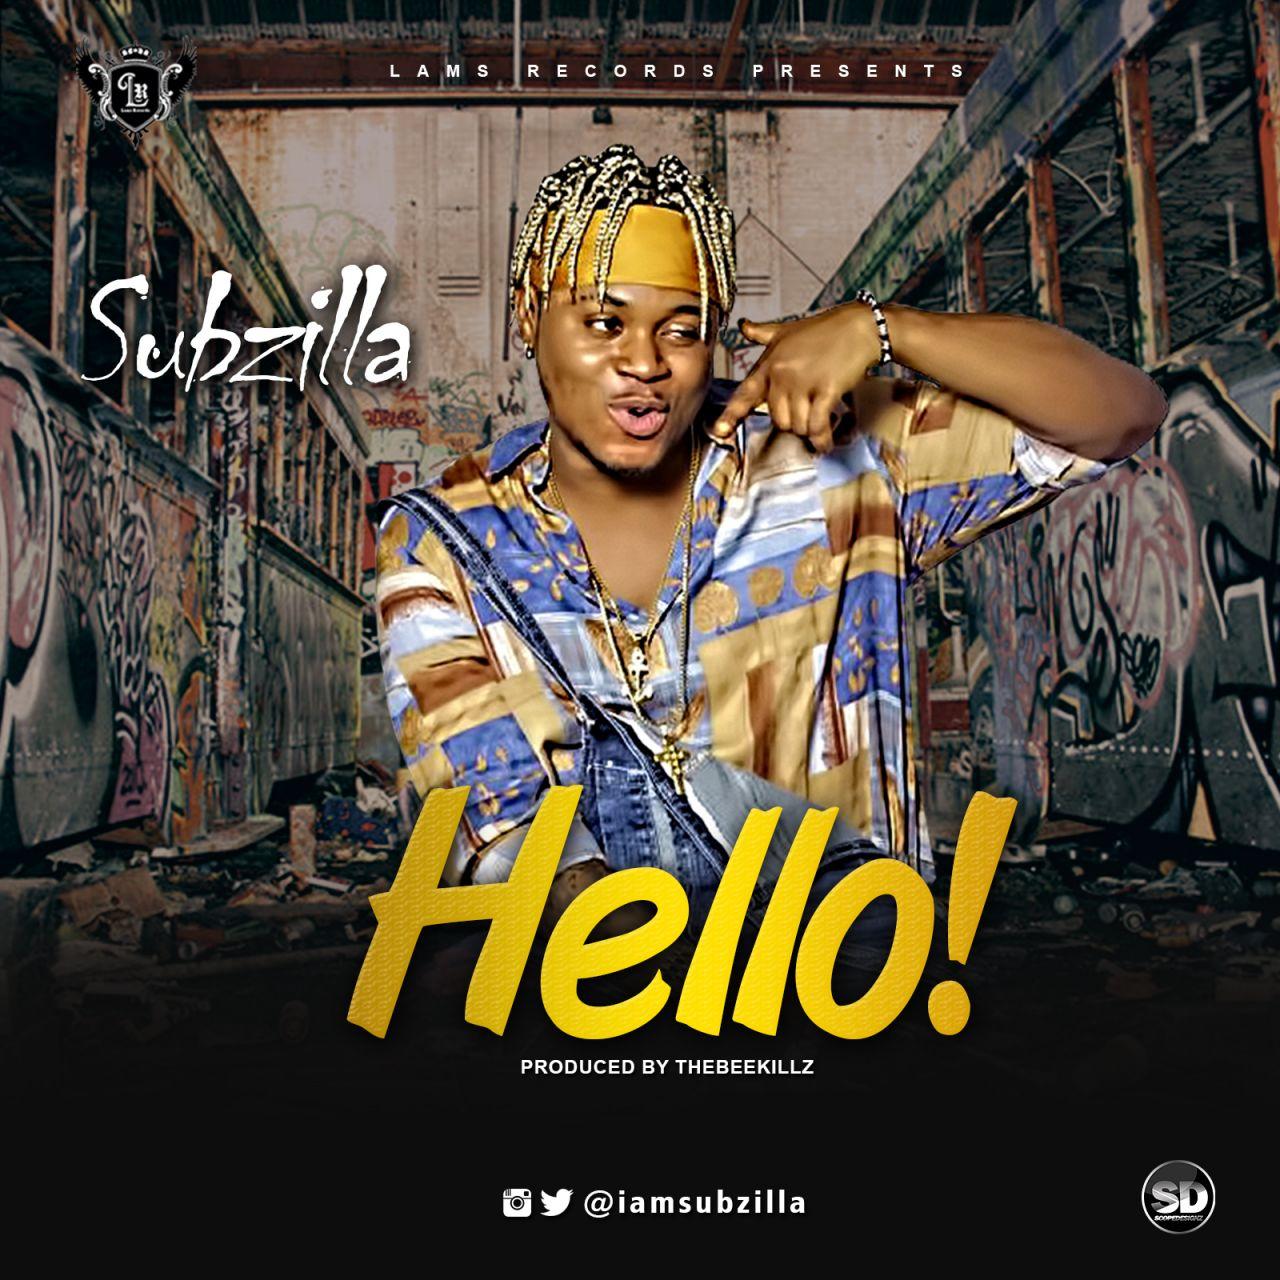 Subzilla – Hello (prod. TheBeeKillz)